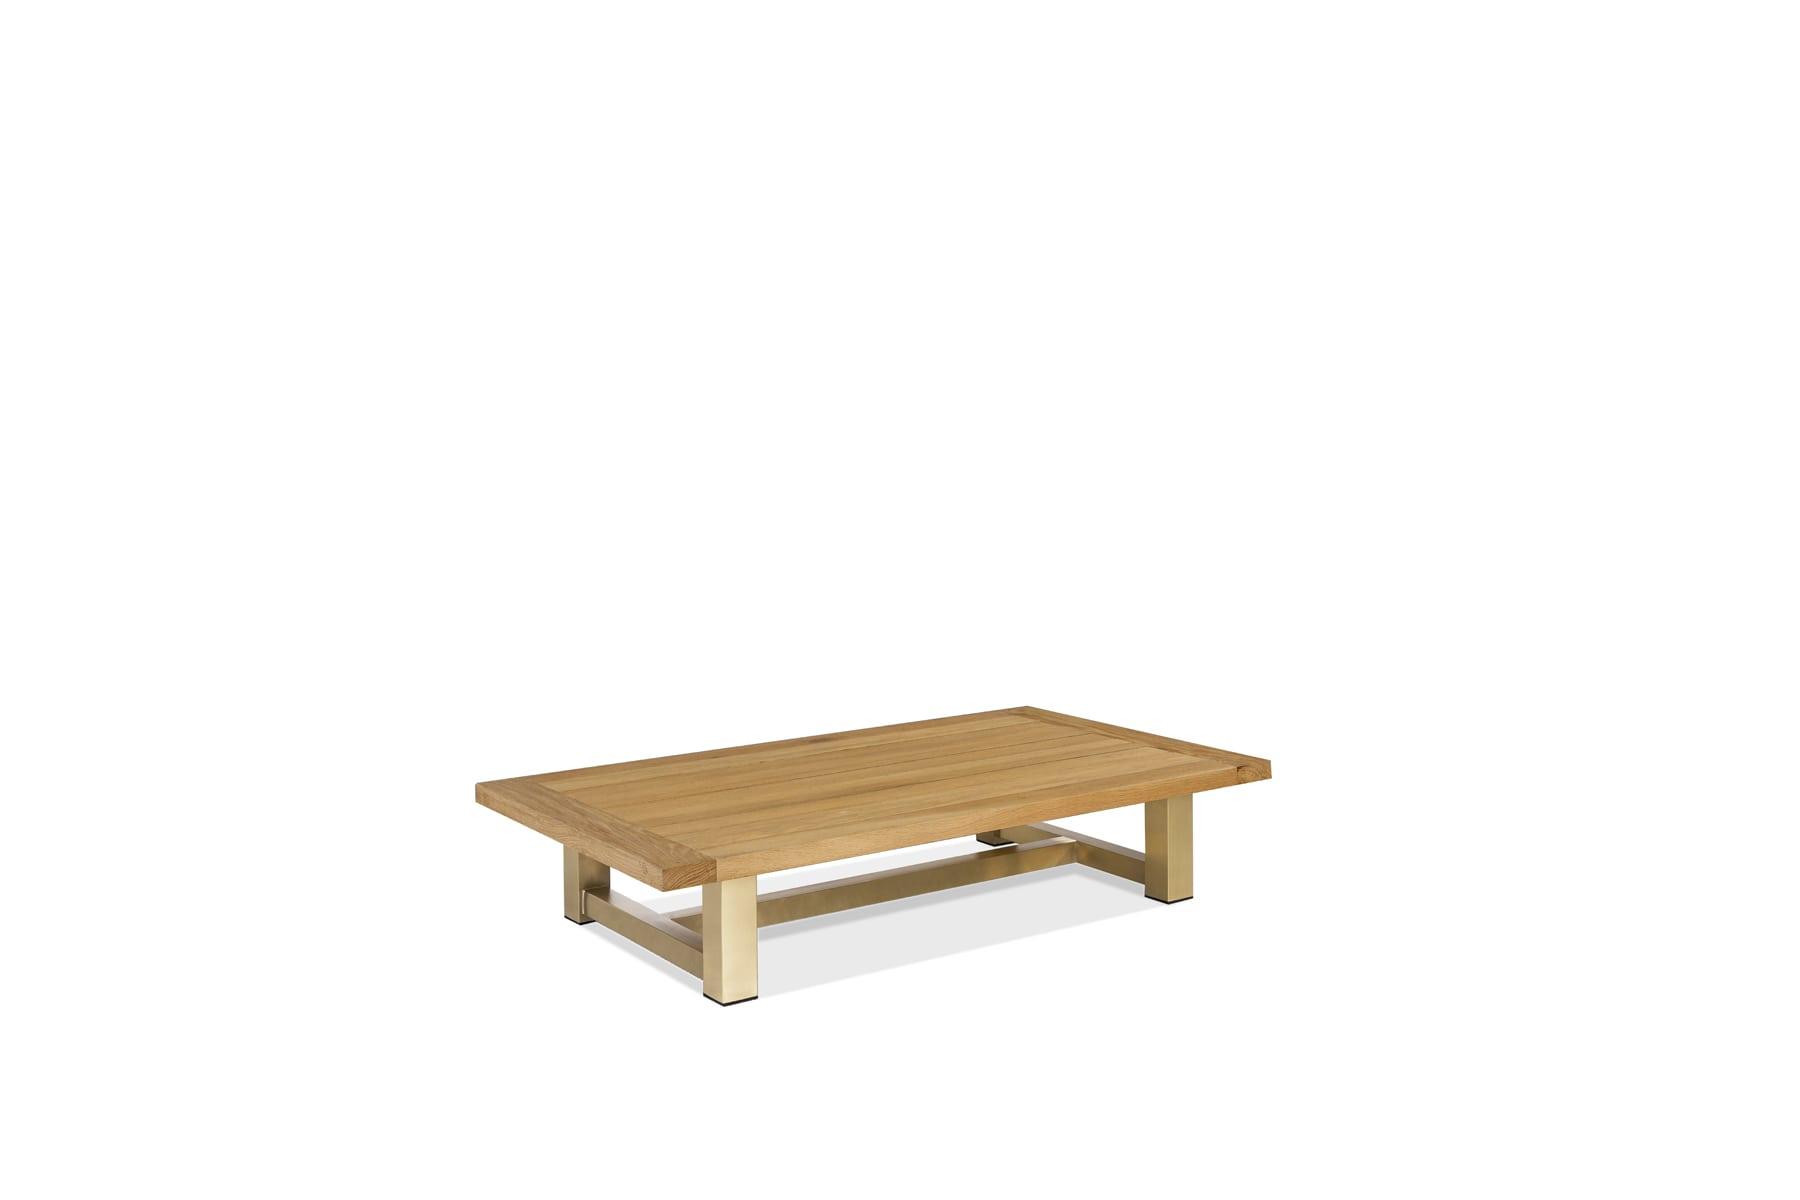 Mclaren Coffee Table Outdoor Coffee Tables Rustic Furniture